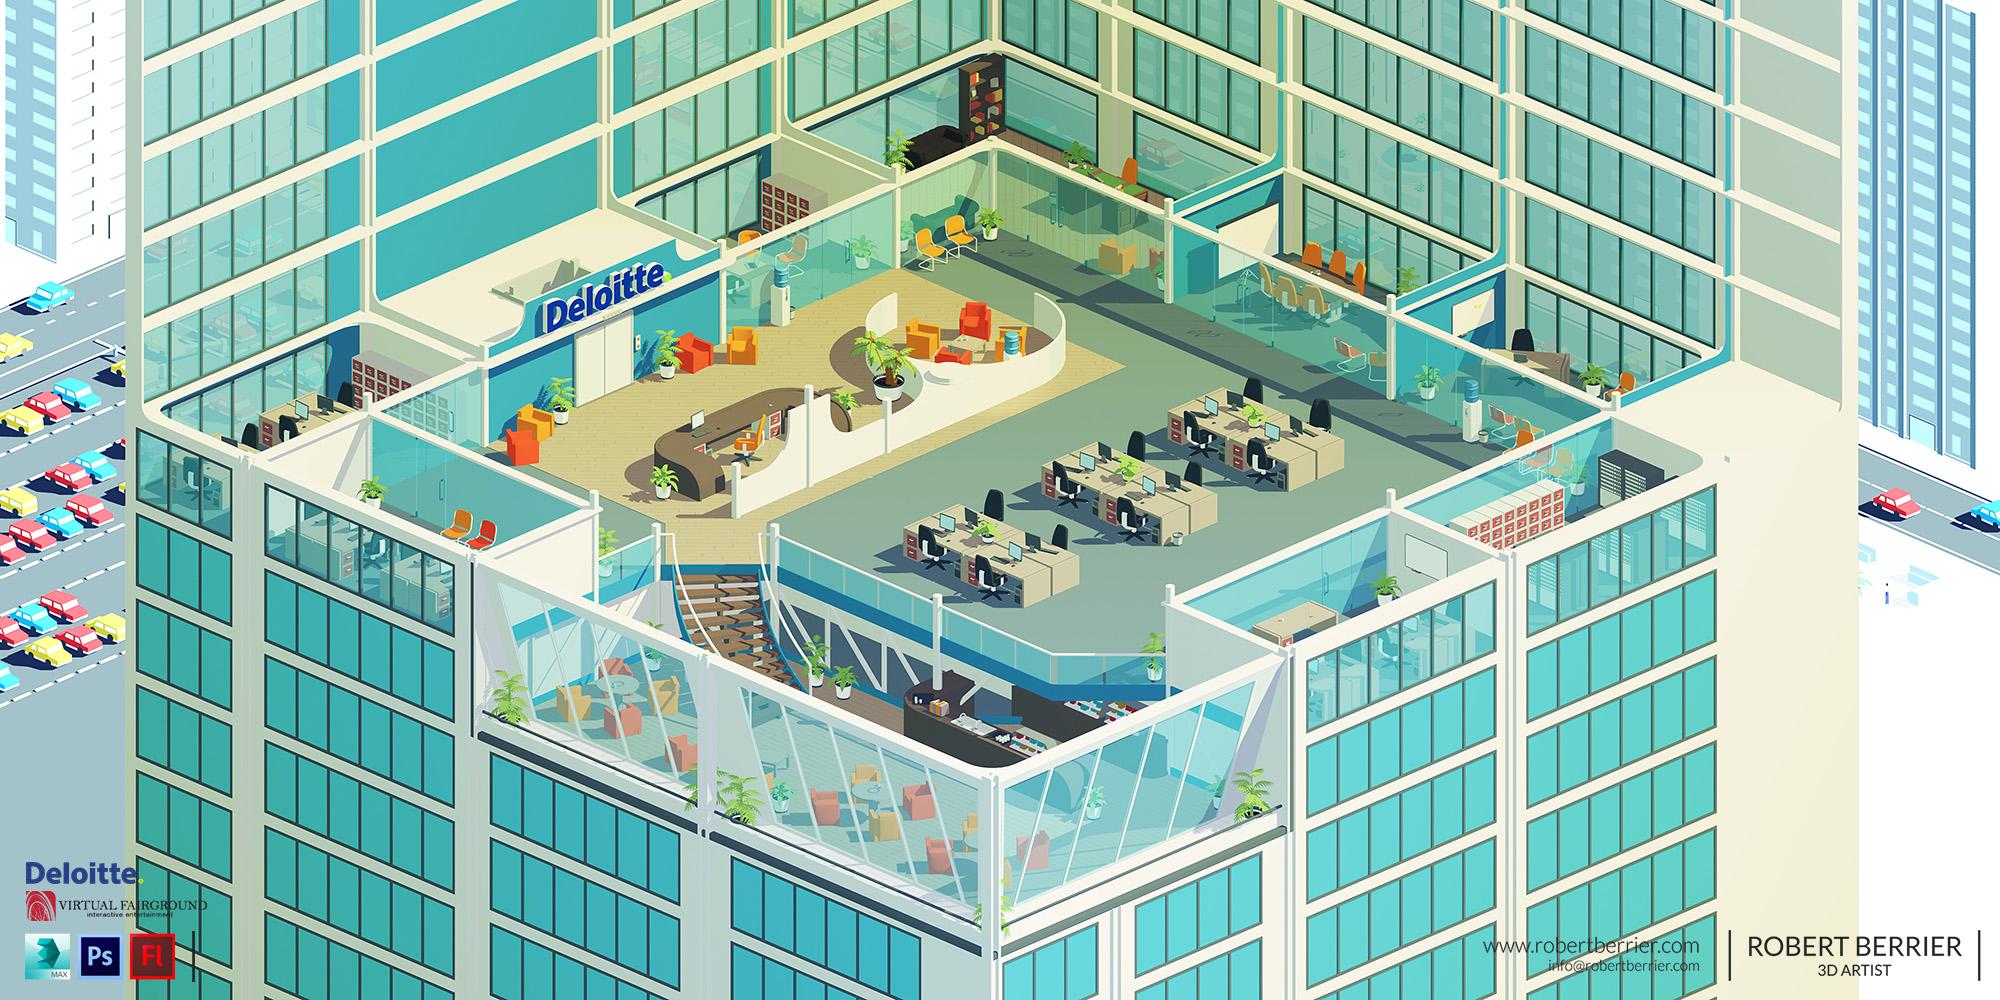 Robert Berrier - Deloitte Office